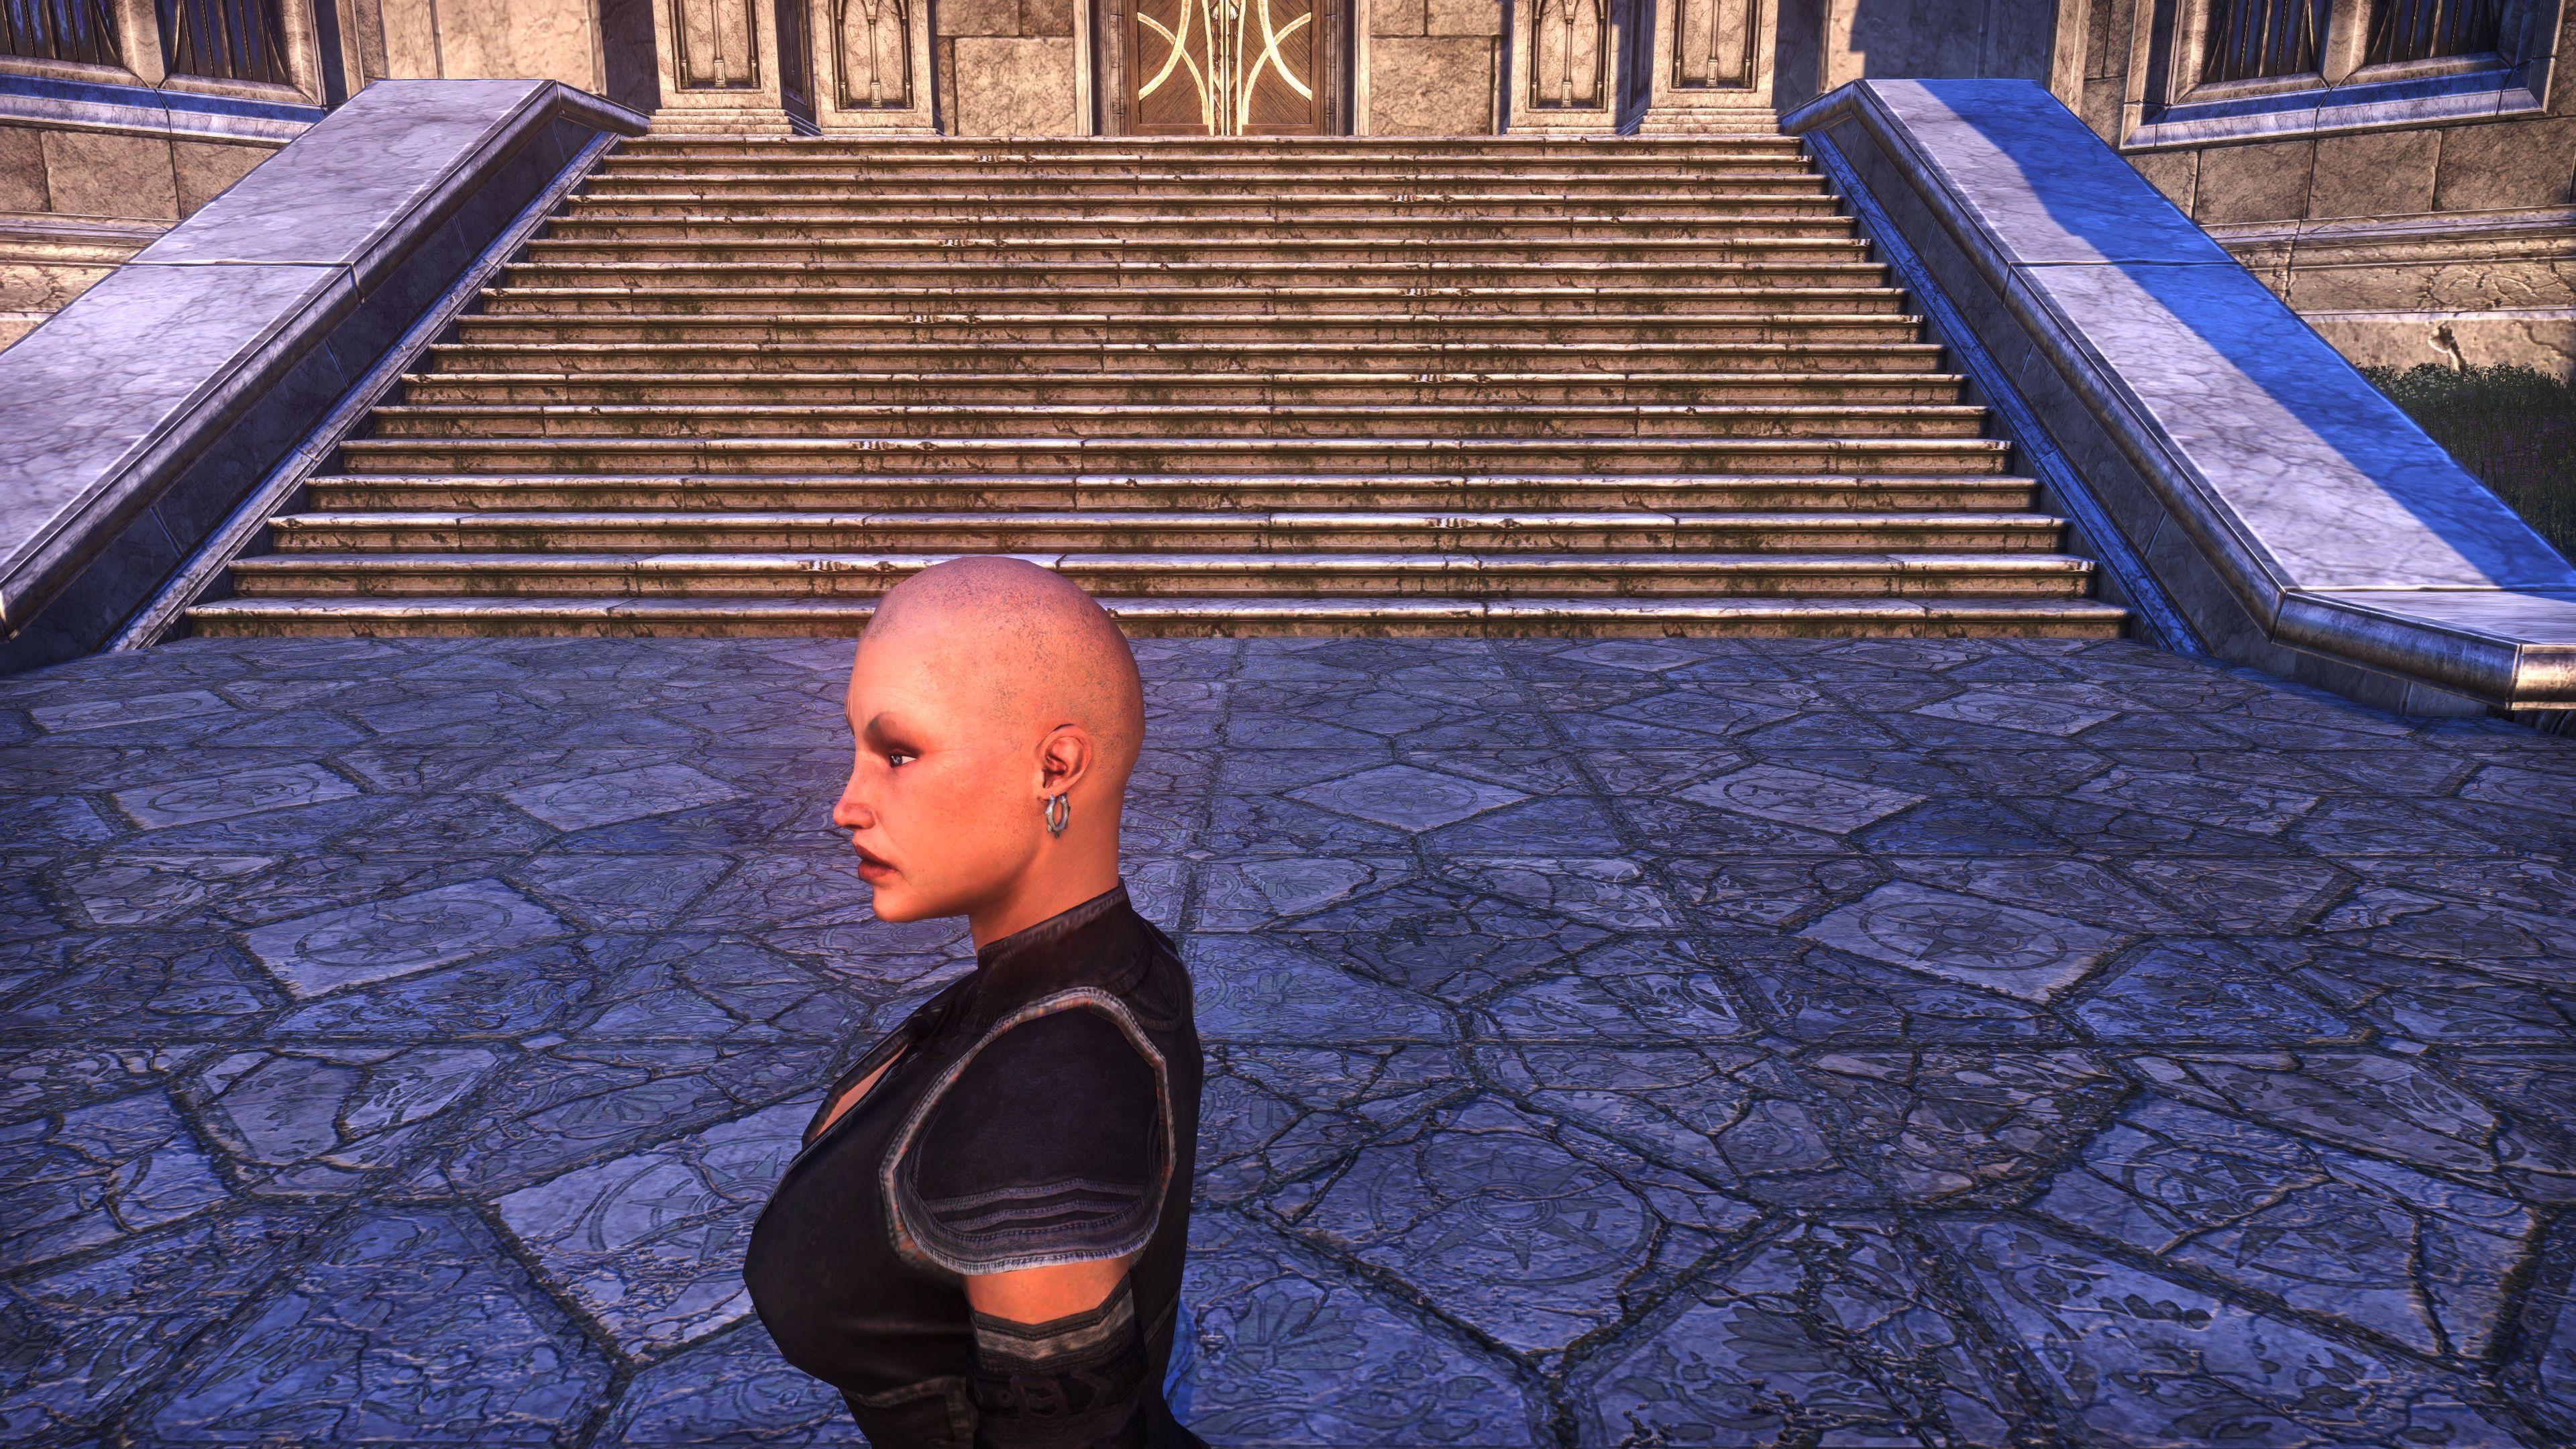 Dwarven Sprocket Earrings (Appearance > Minor Adornments), Psijic Vault Crate, The Elder Scrolls Online